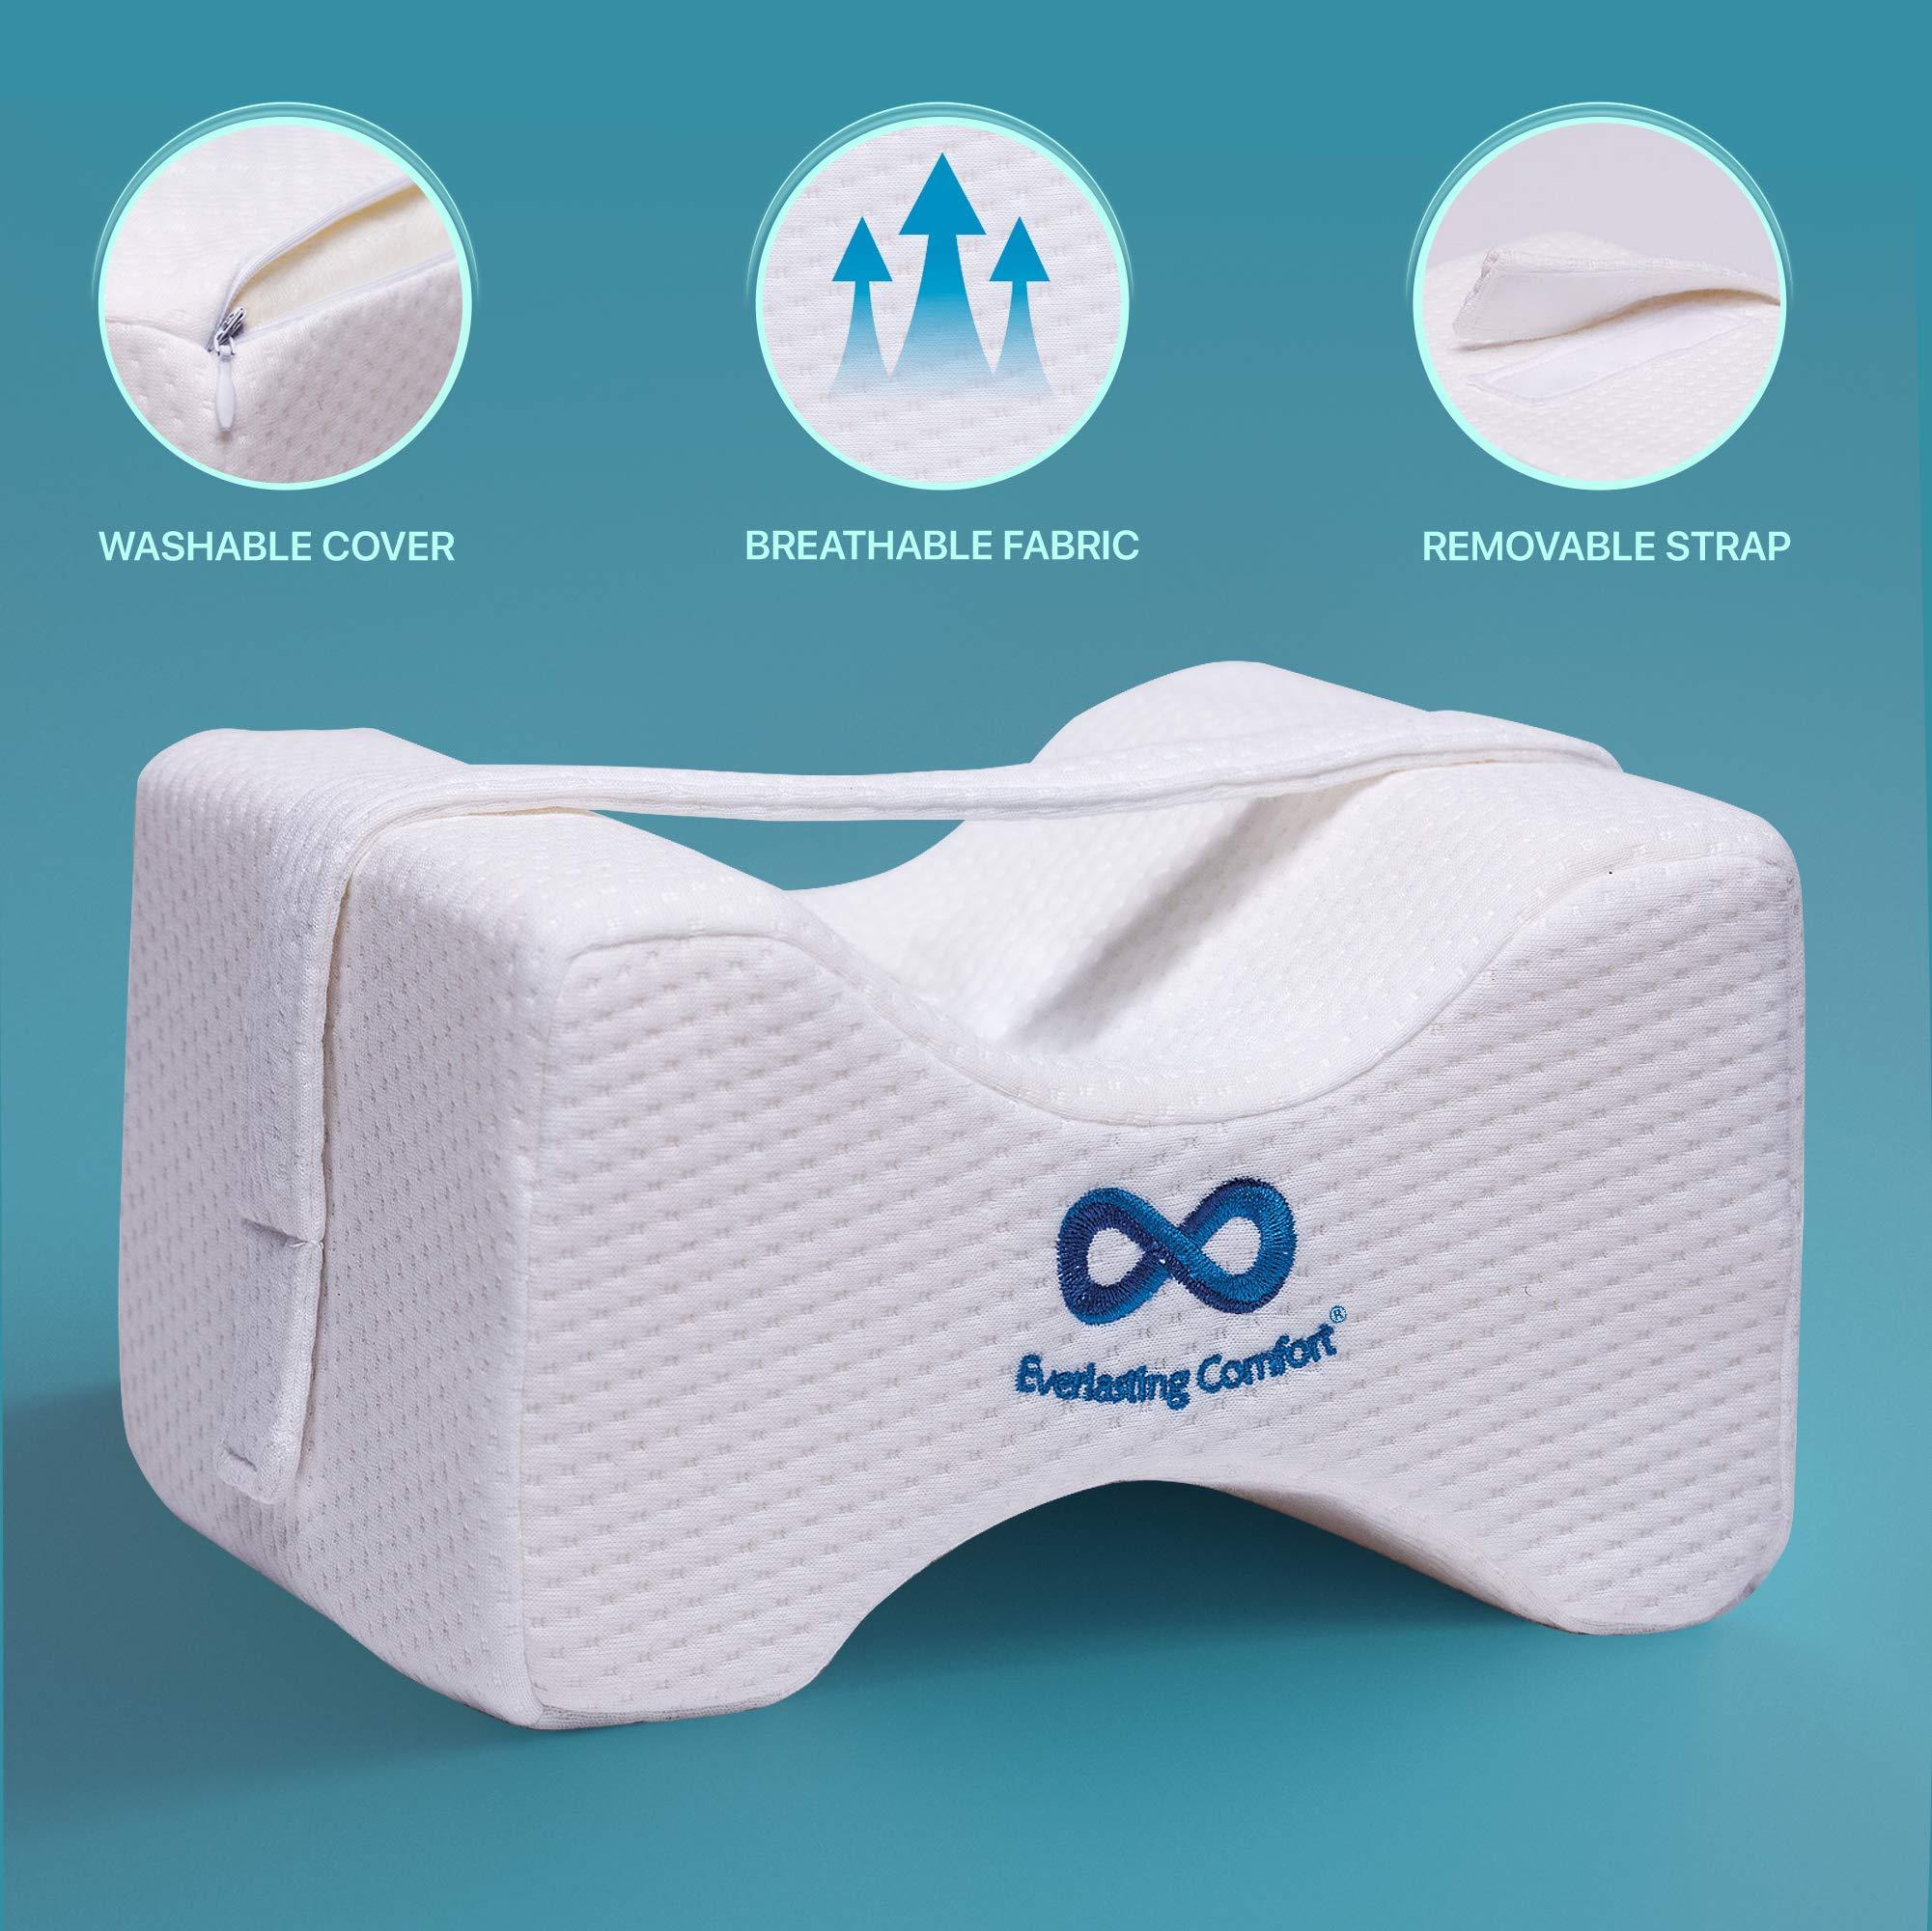 Everlasting Comfort 100 Pure Memory Foam Knee Pillow With